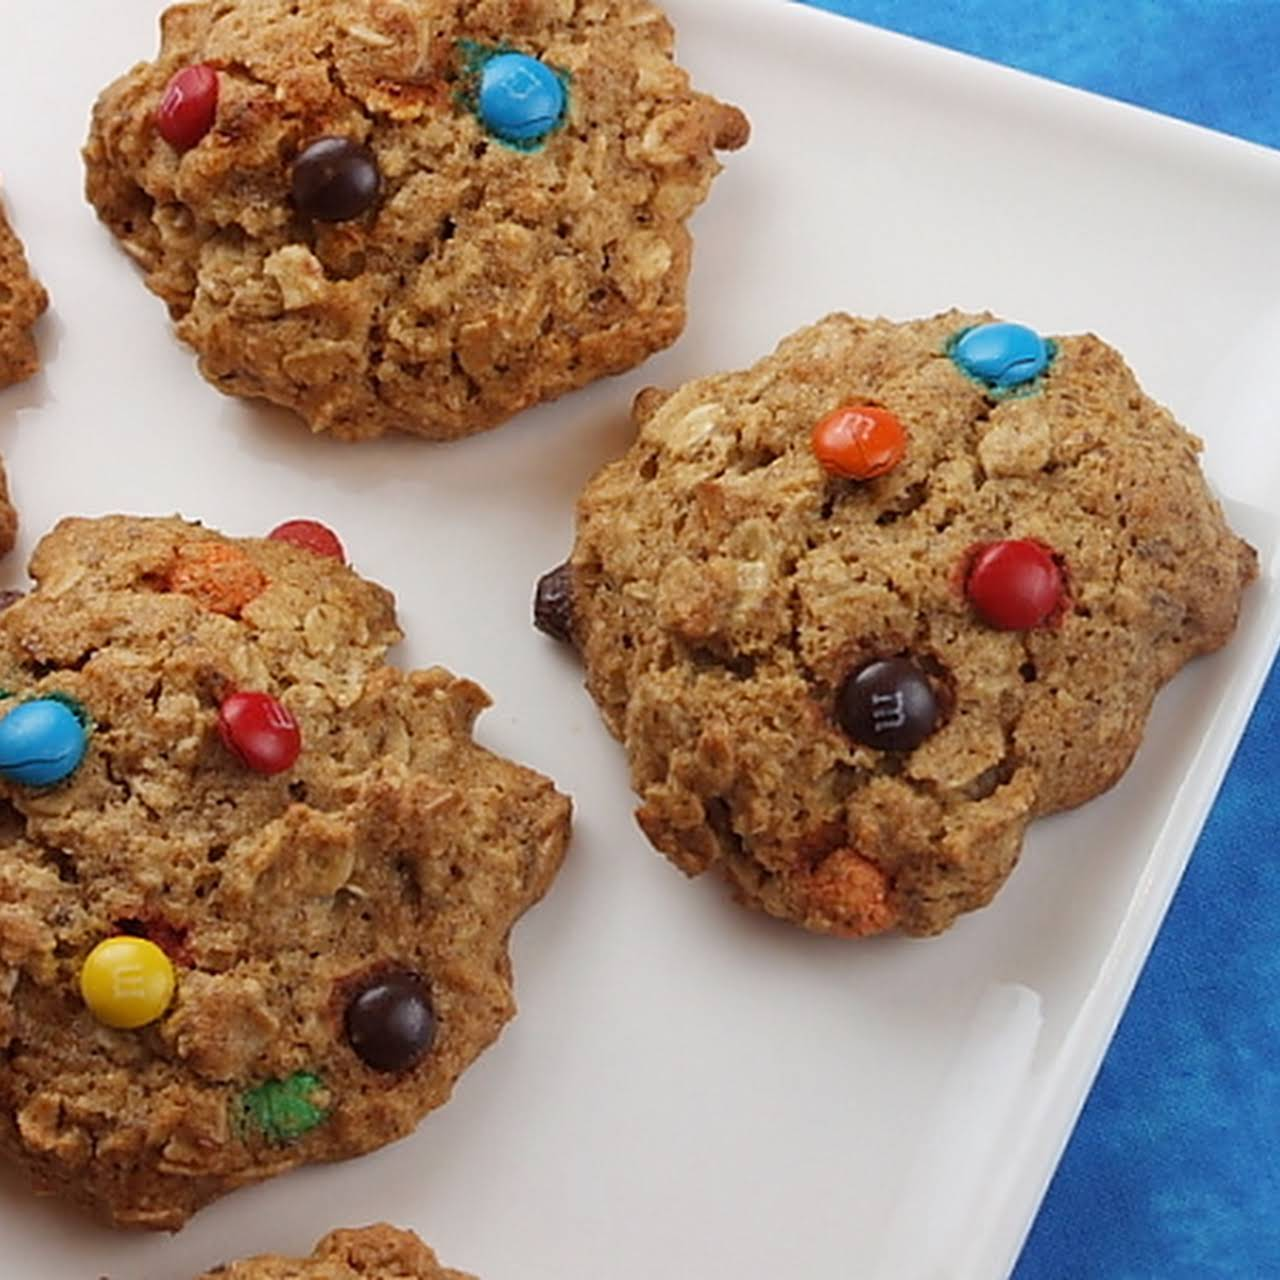 Agave & Honey Oatmeal- M&M Cookies